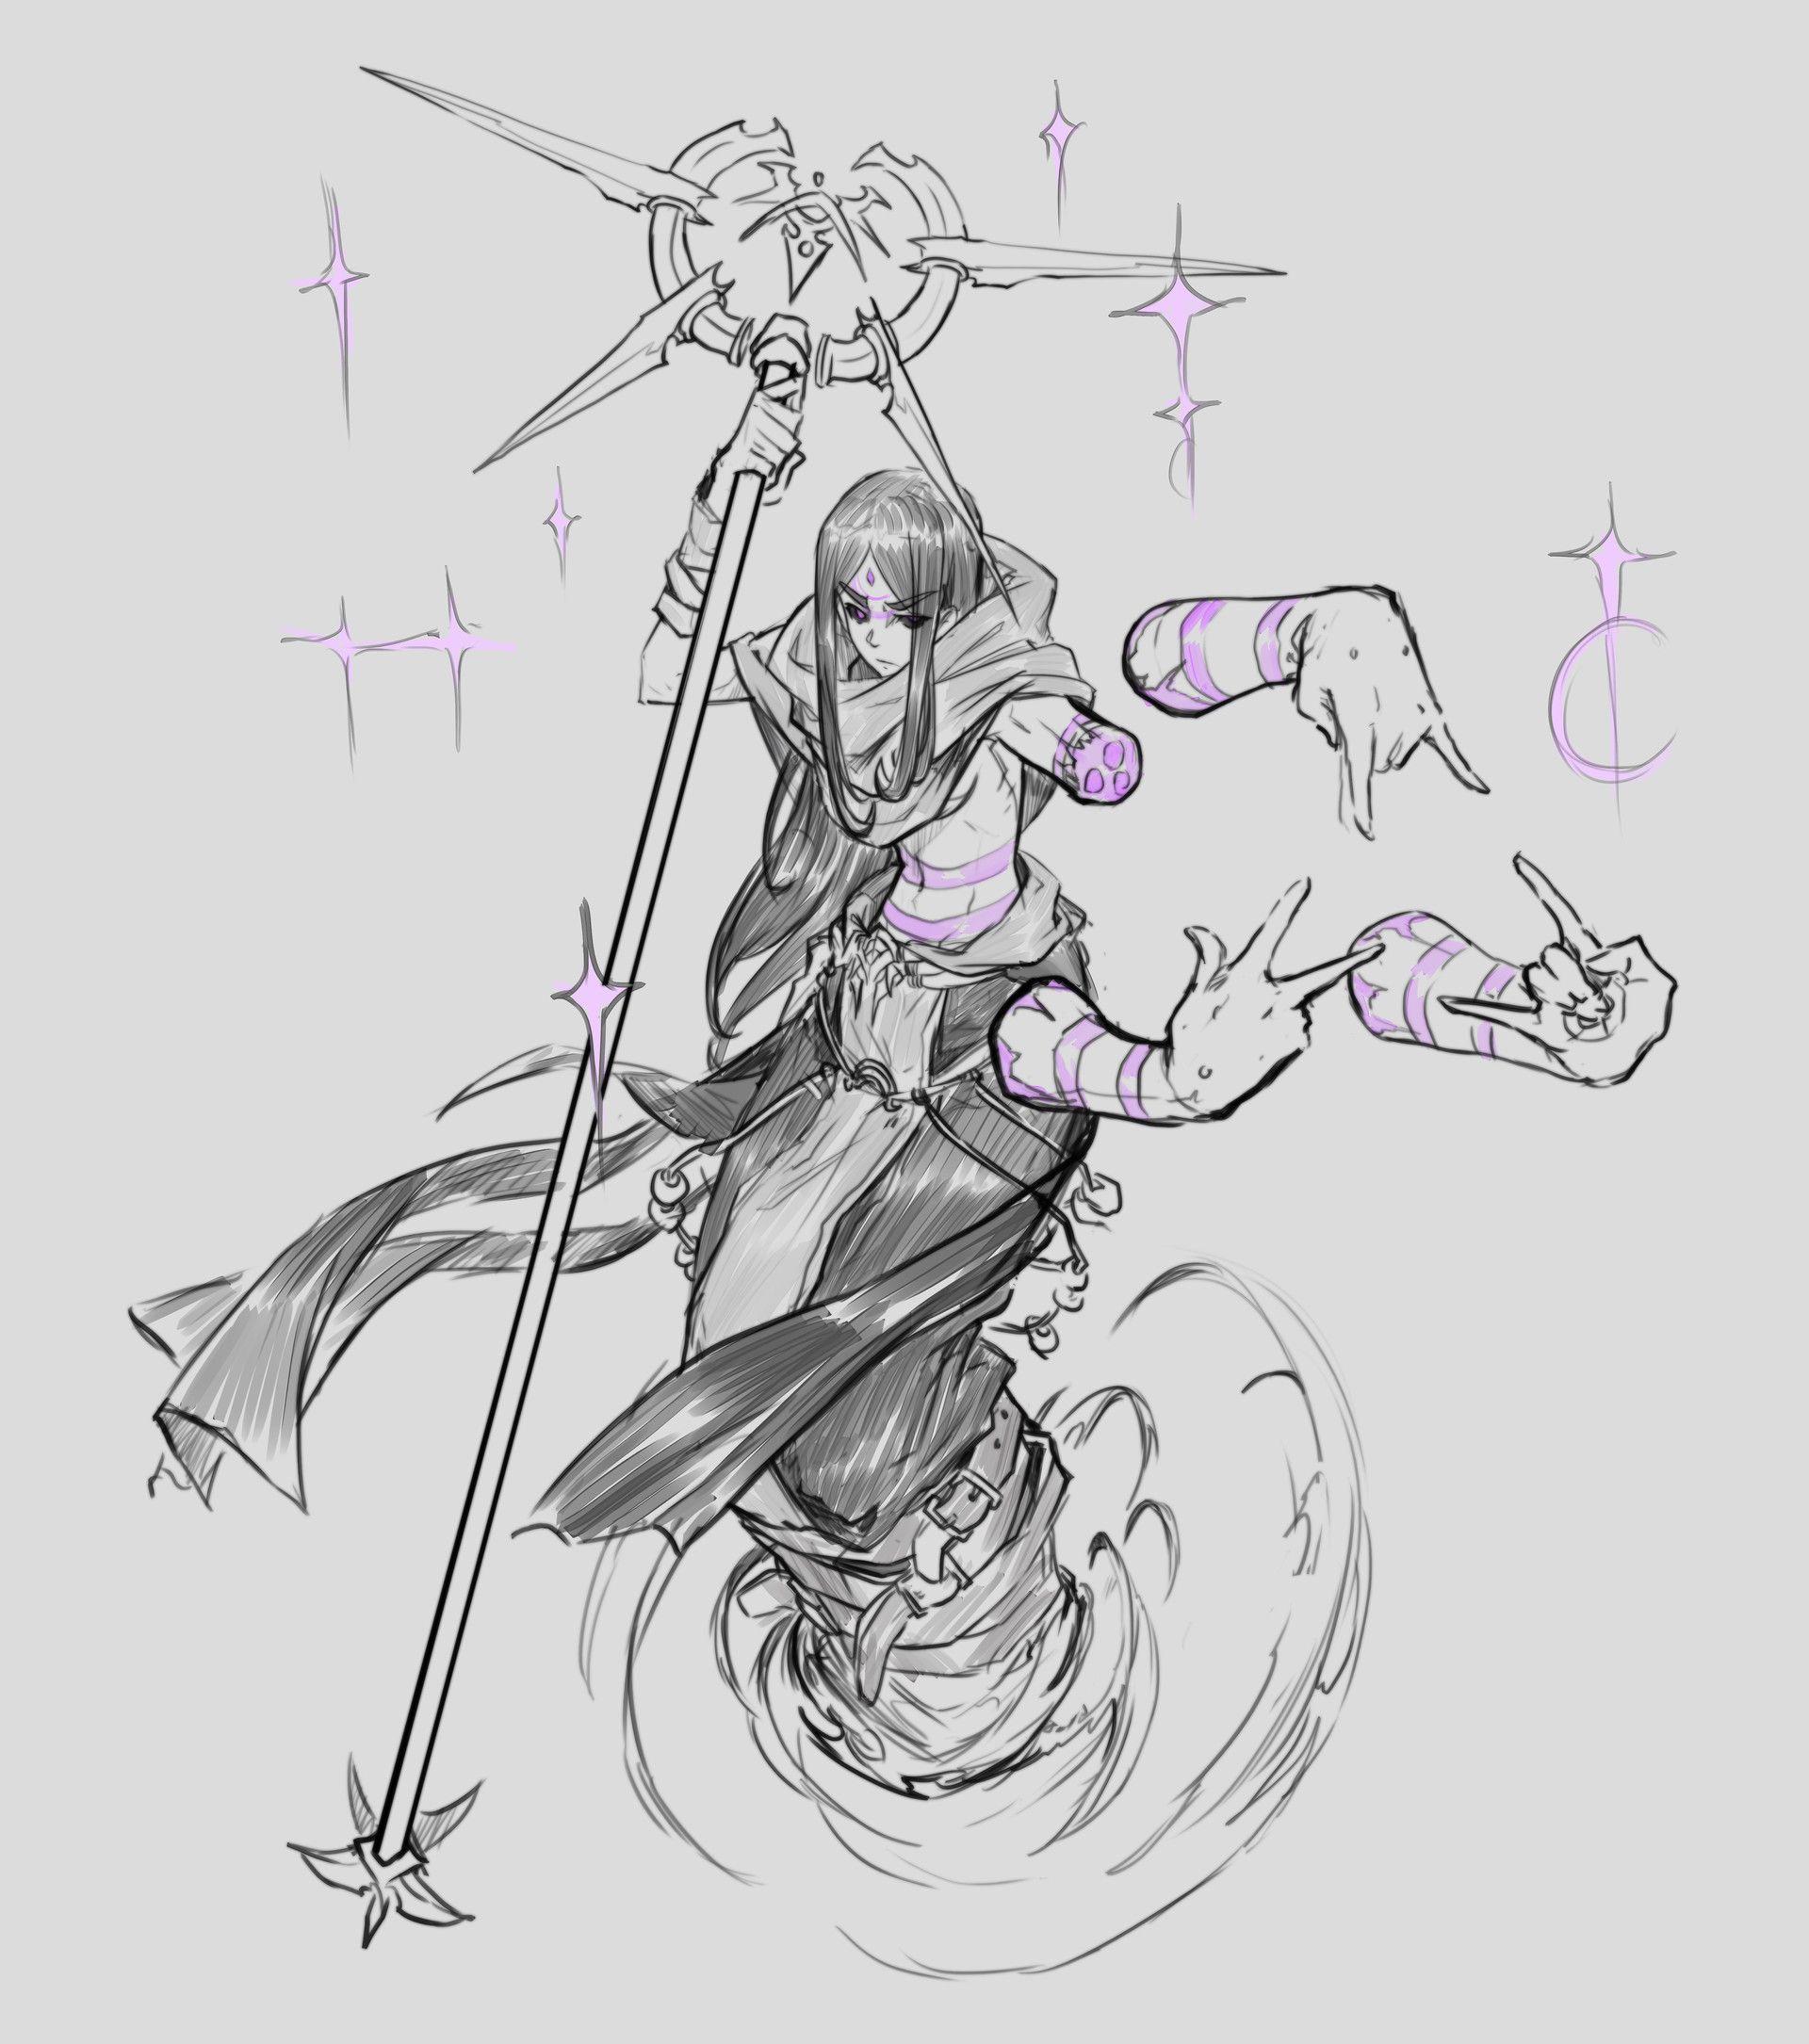 Monster Sketch Dump by Josh Corpuz on ArtStation.